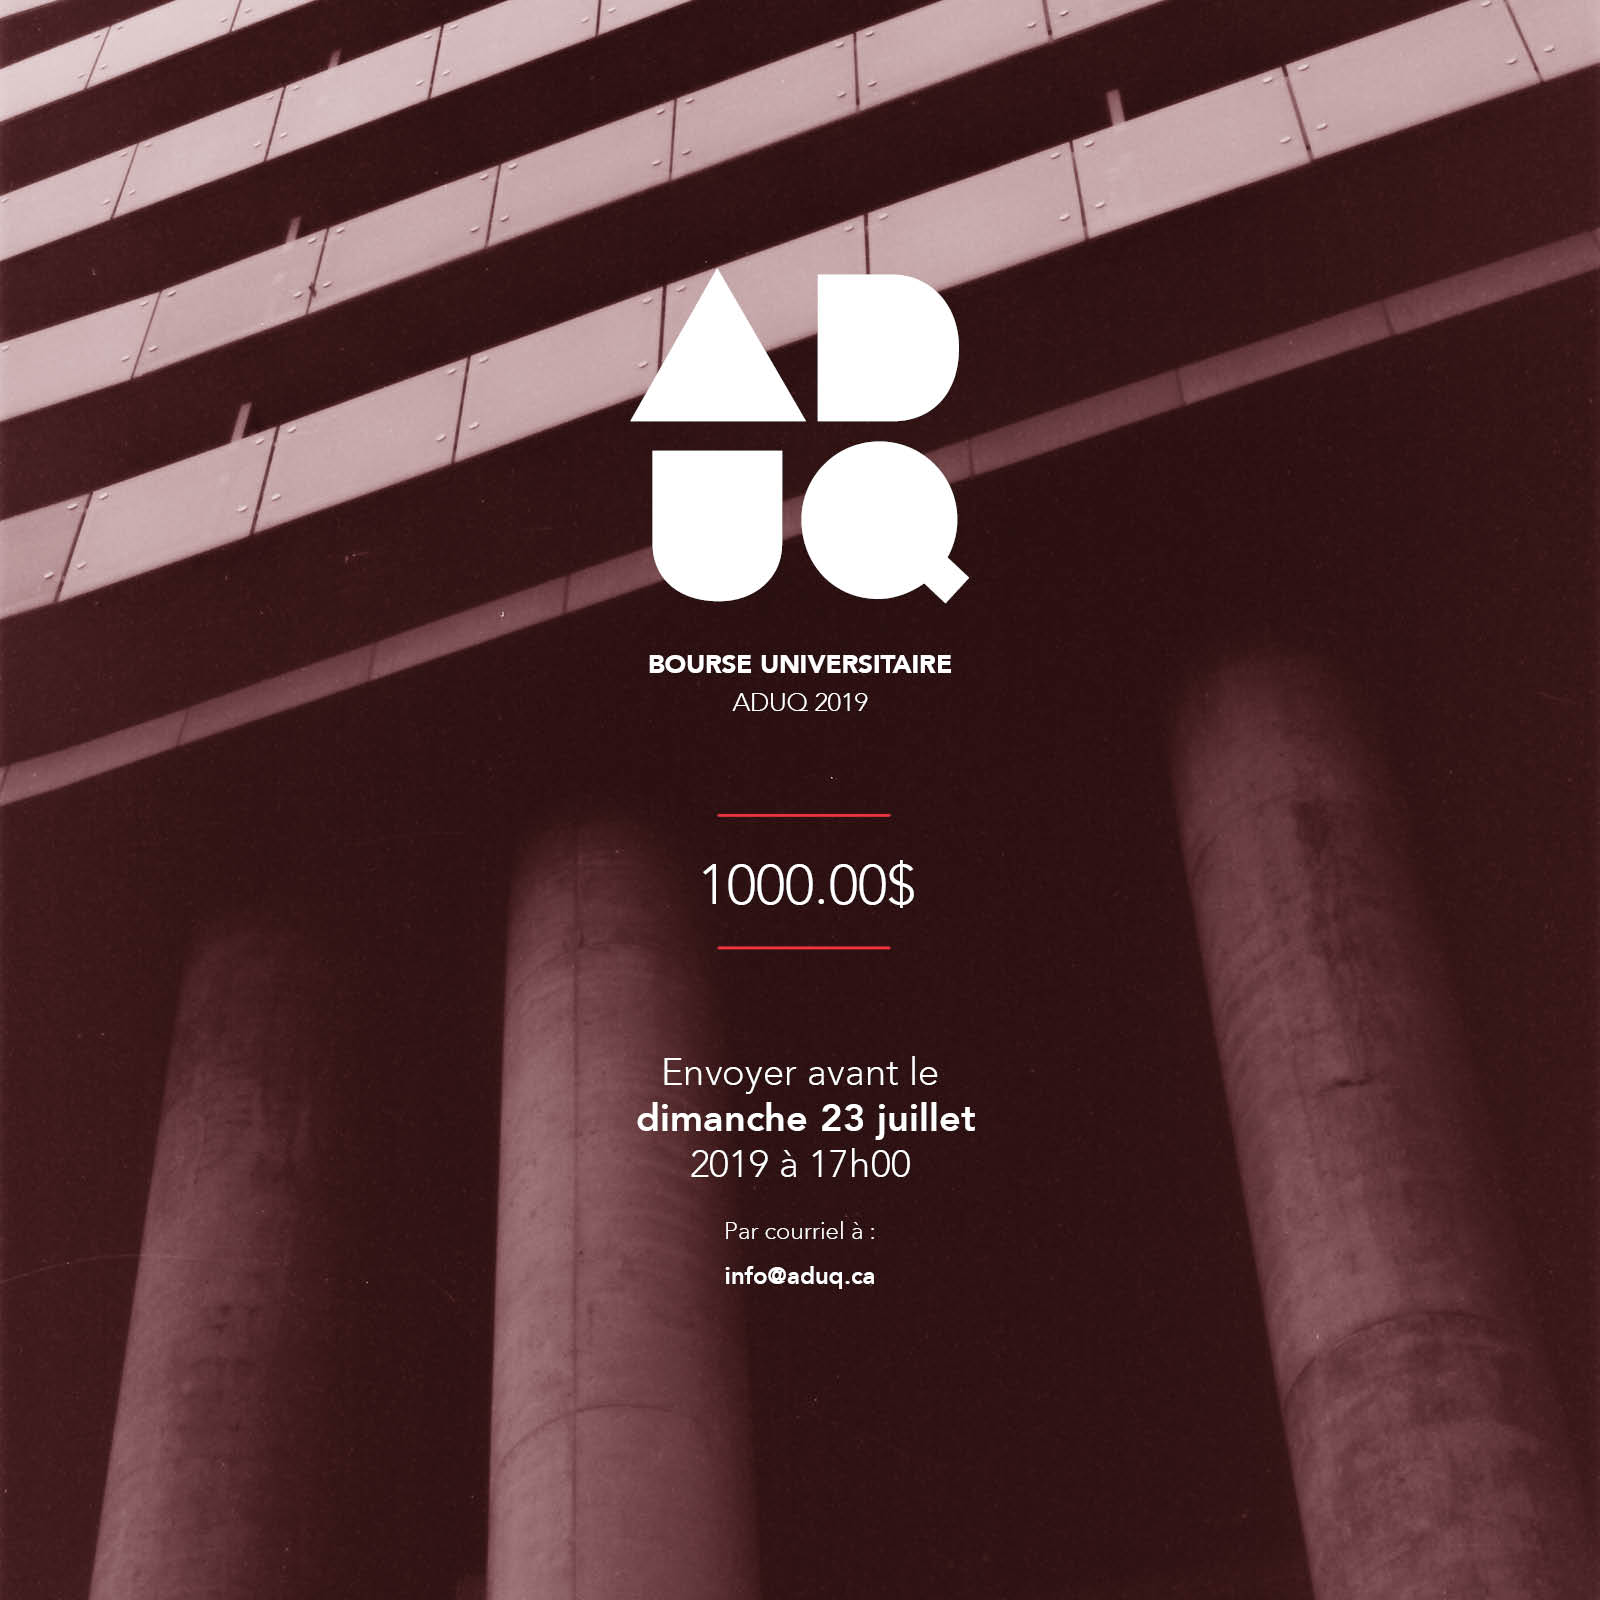 ADUQ-bourse2019 (1).jpg